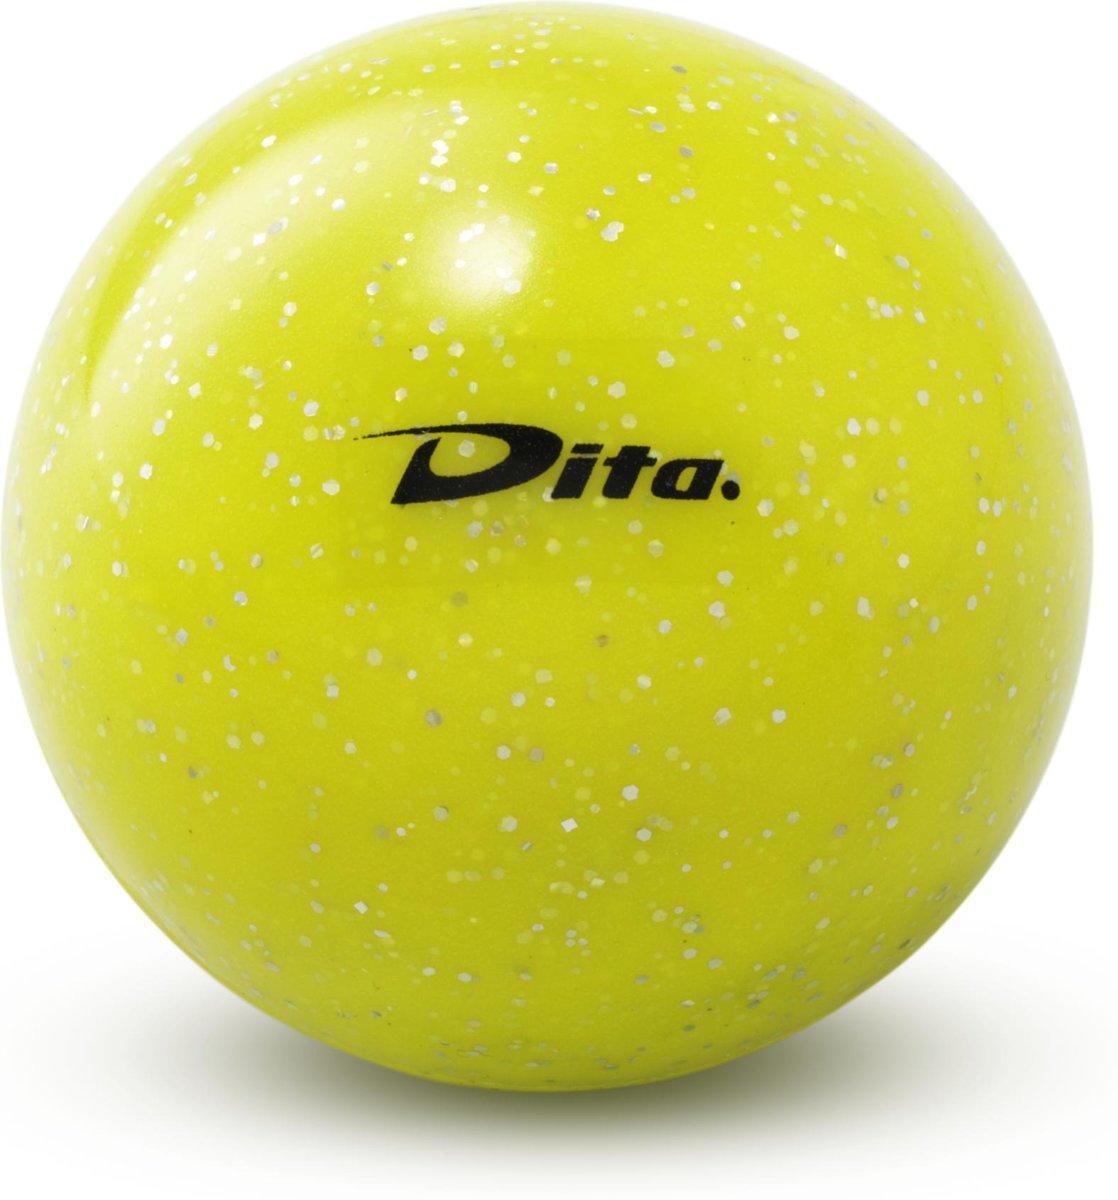 Dita Glitter ball - Veldhockeybal - Geel kopen